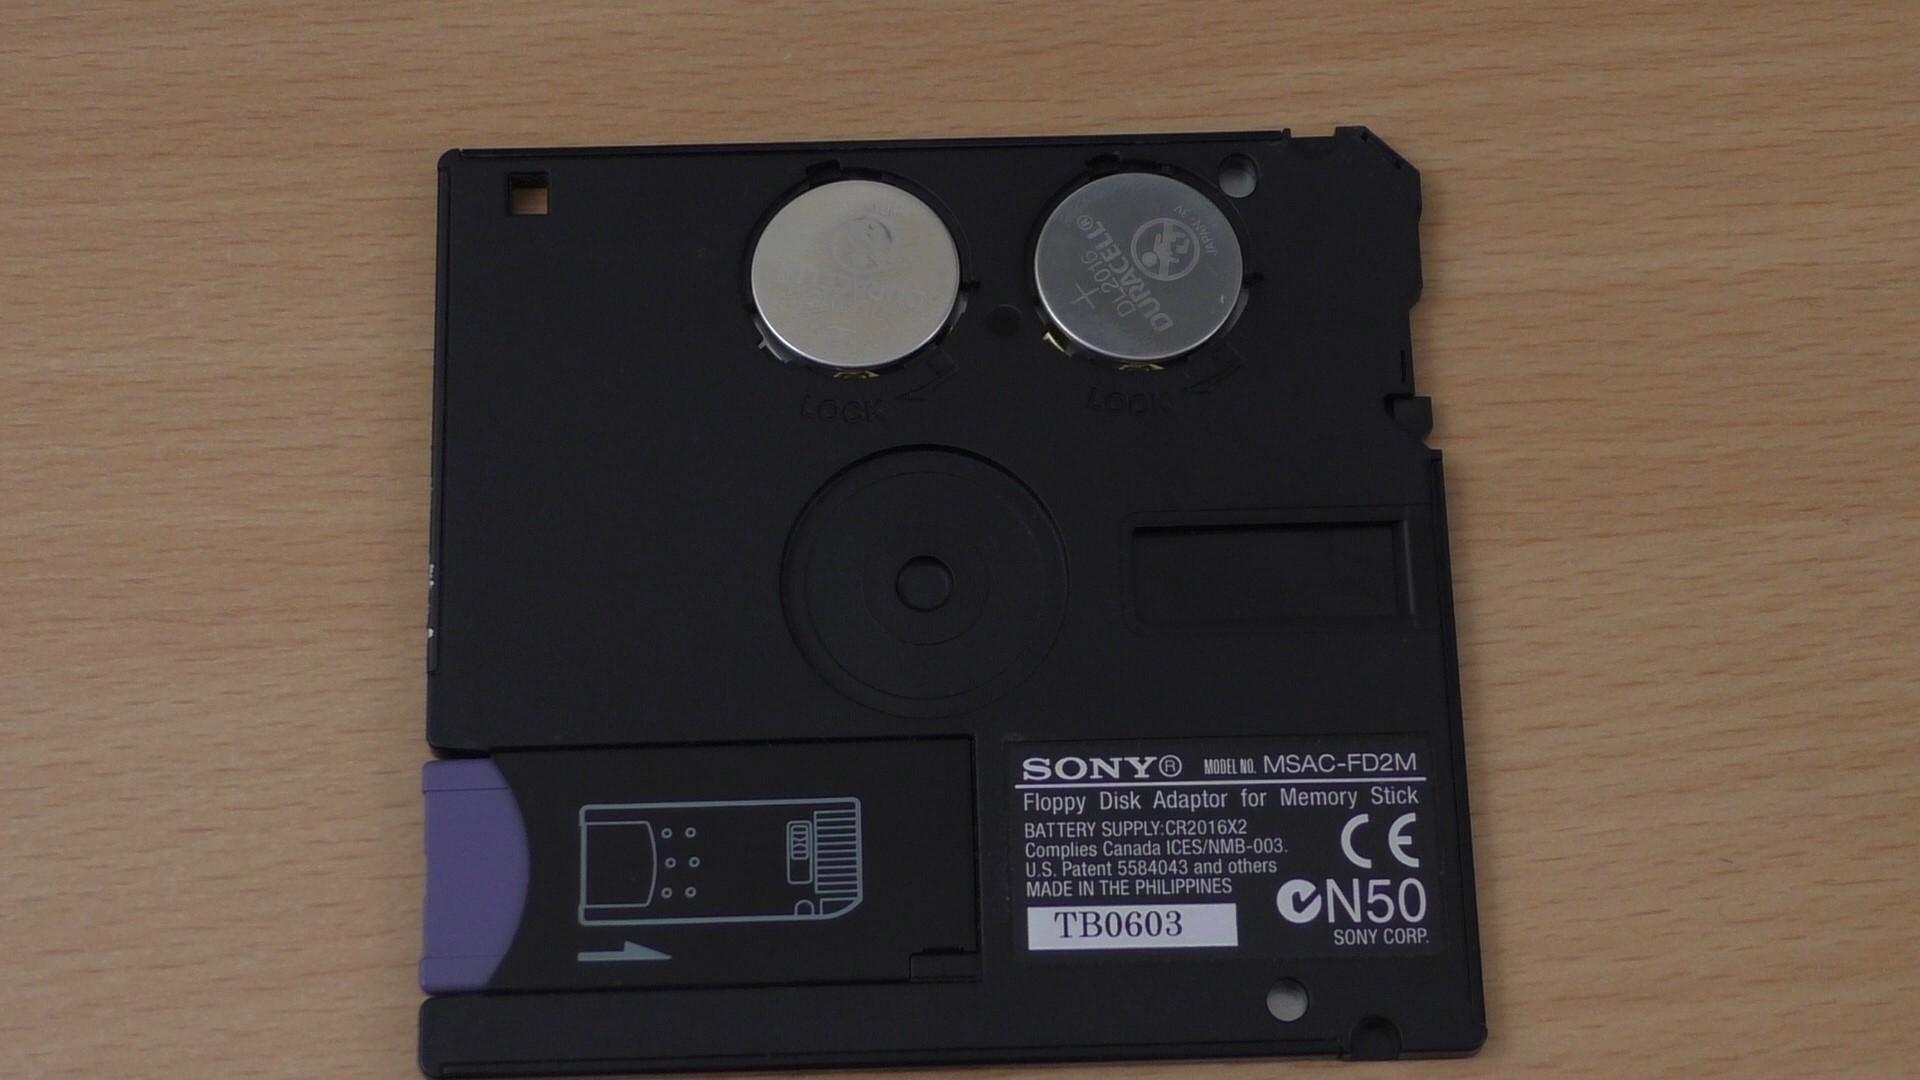 Фотоаппарат на дискетах: 8 интересных фактов о Sony Mavica MVC-FD85 (много картинок) - 23